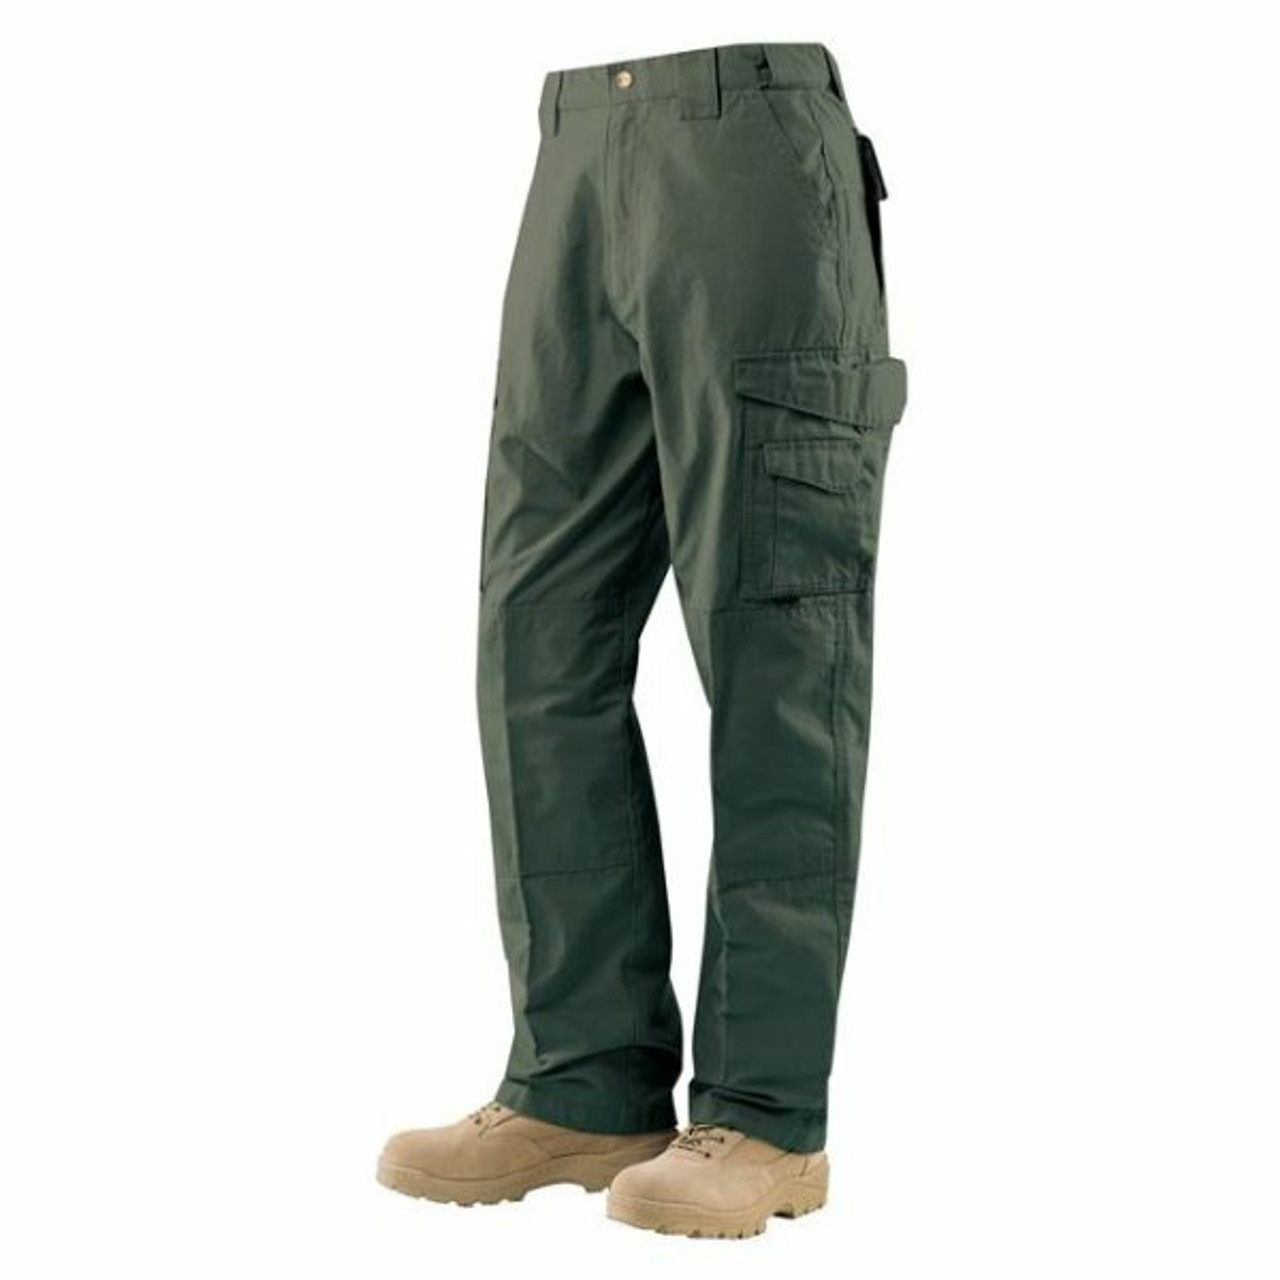 Tactical Pants Tru Spec 24 7 Series Rip Stop